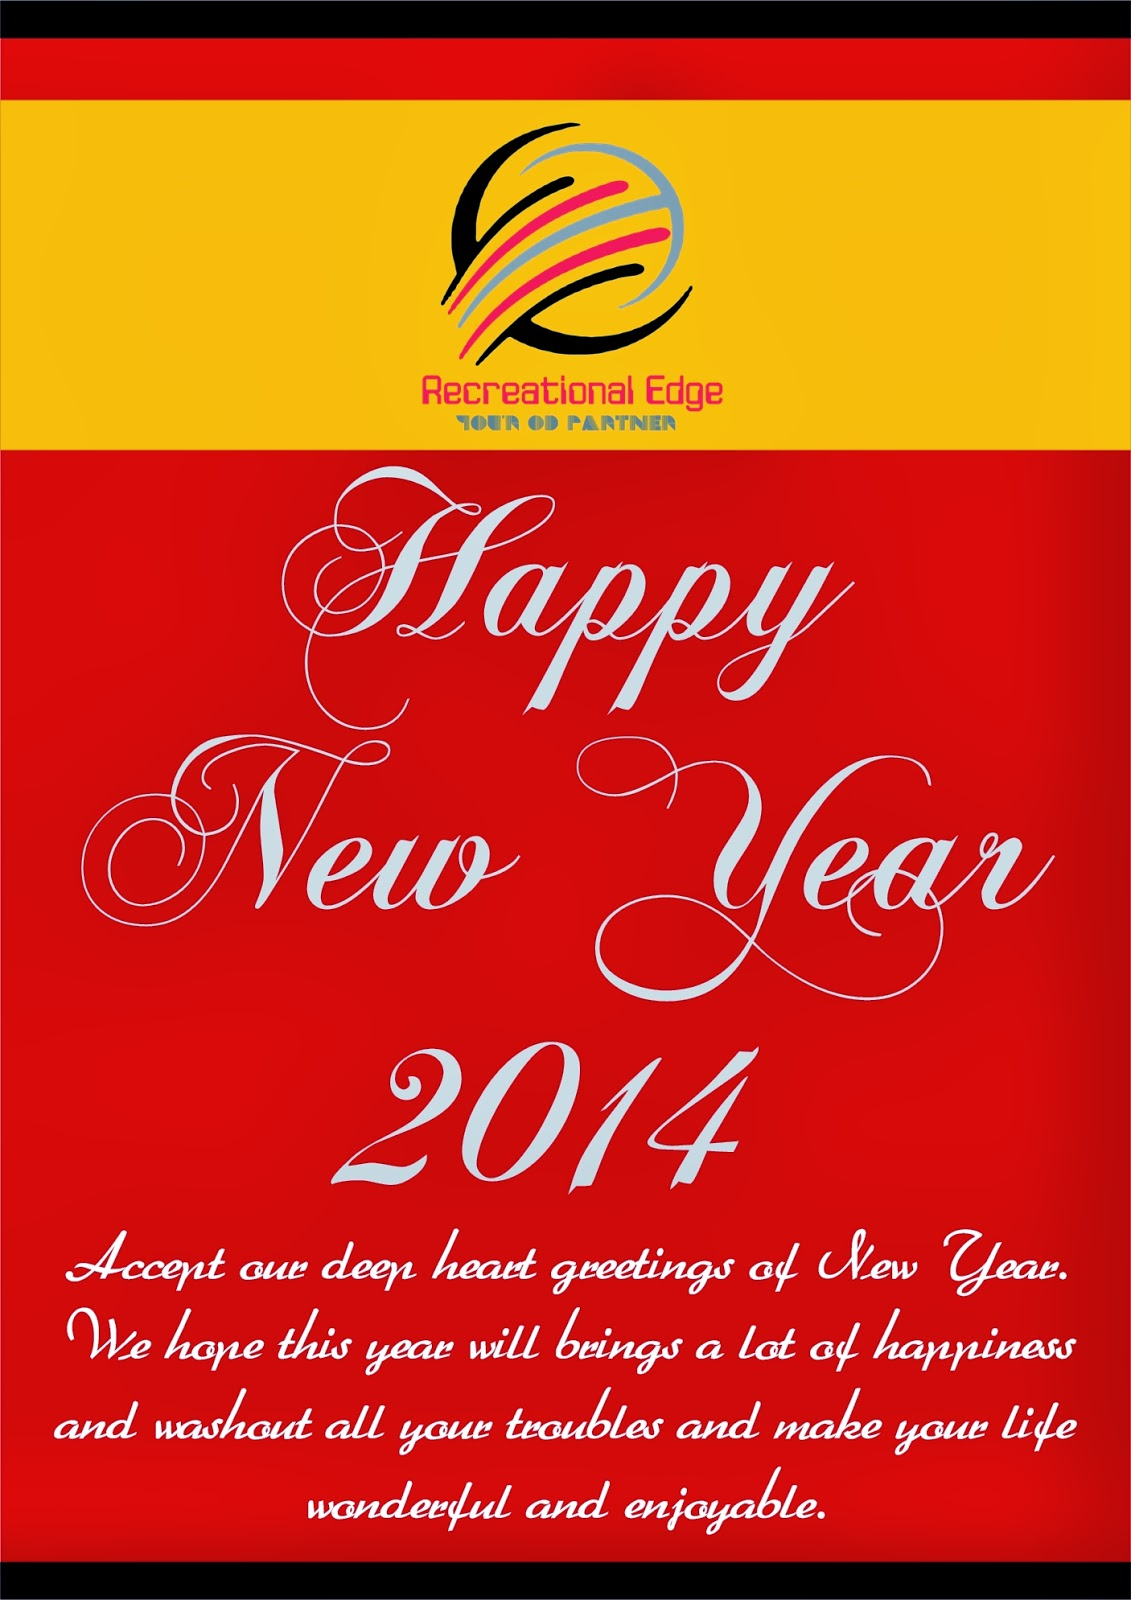 Greeting Of New Year 2014 Team Recreational Edge Recreational